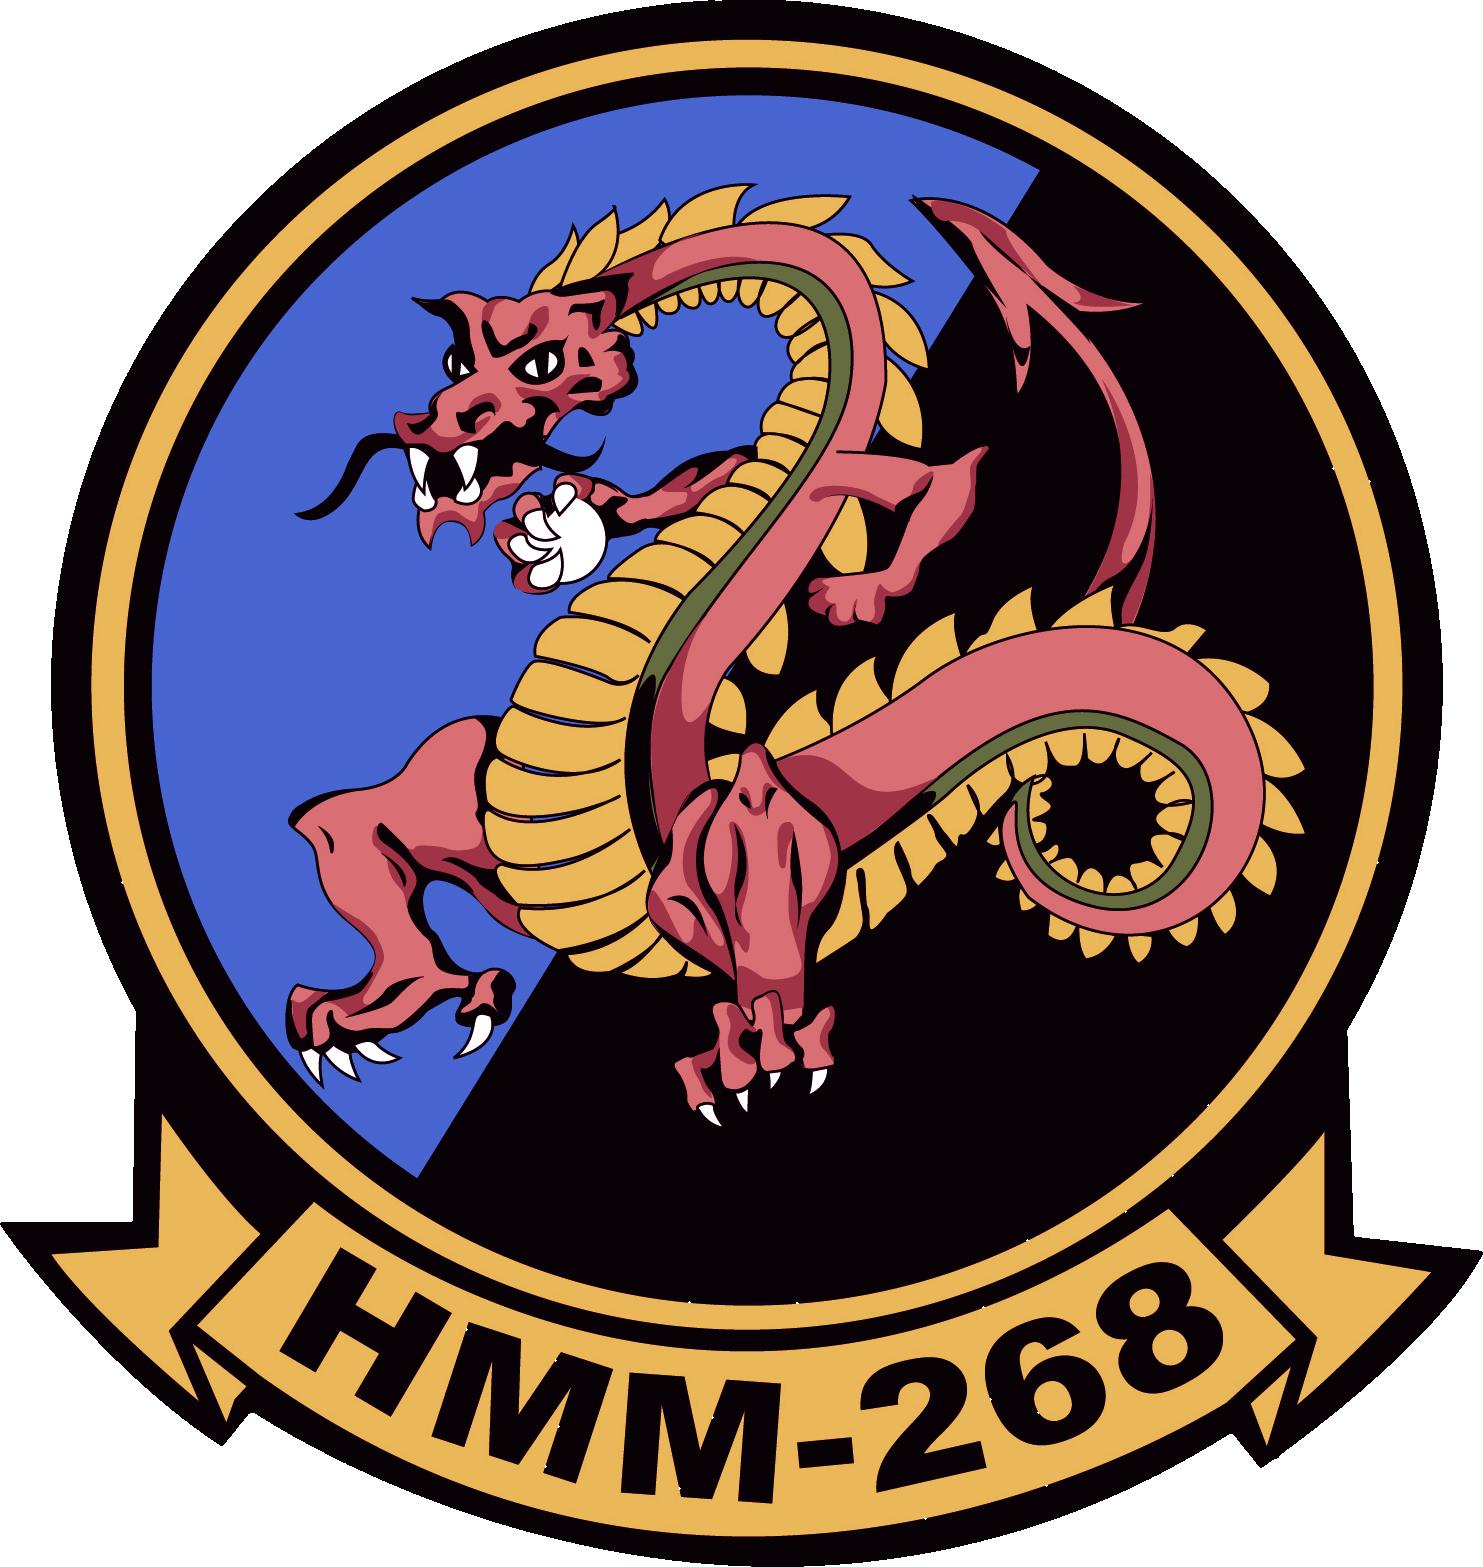 El juego de las imagenes-http://upload.wikimedia.org/wikipedia/commons/8/83/HMM-268_insignia.png